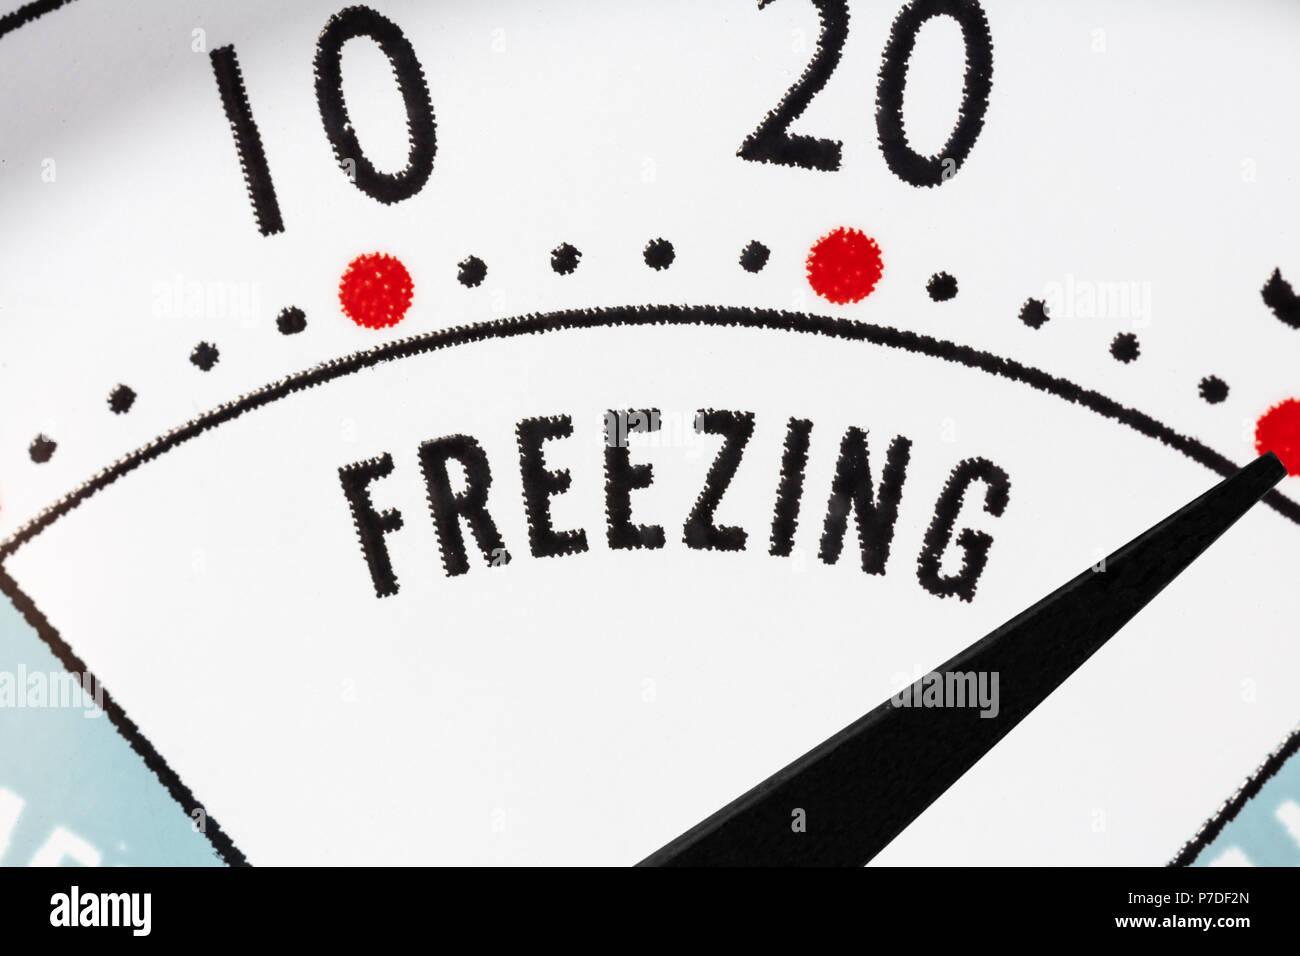 Freezing zone refrigerator thermometer macro close up detail. - Stock Image